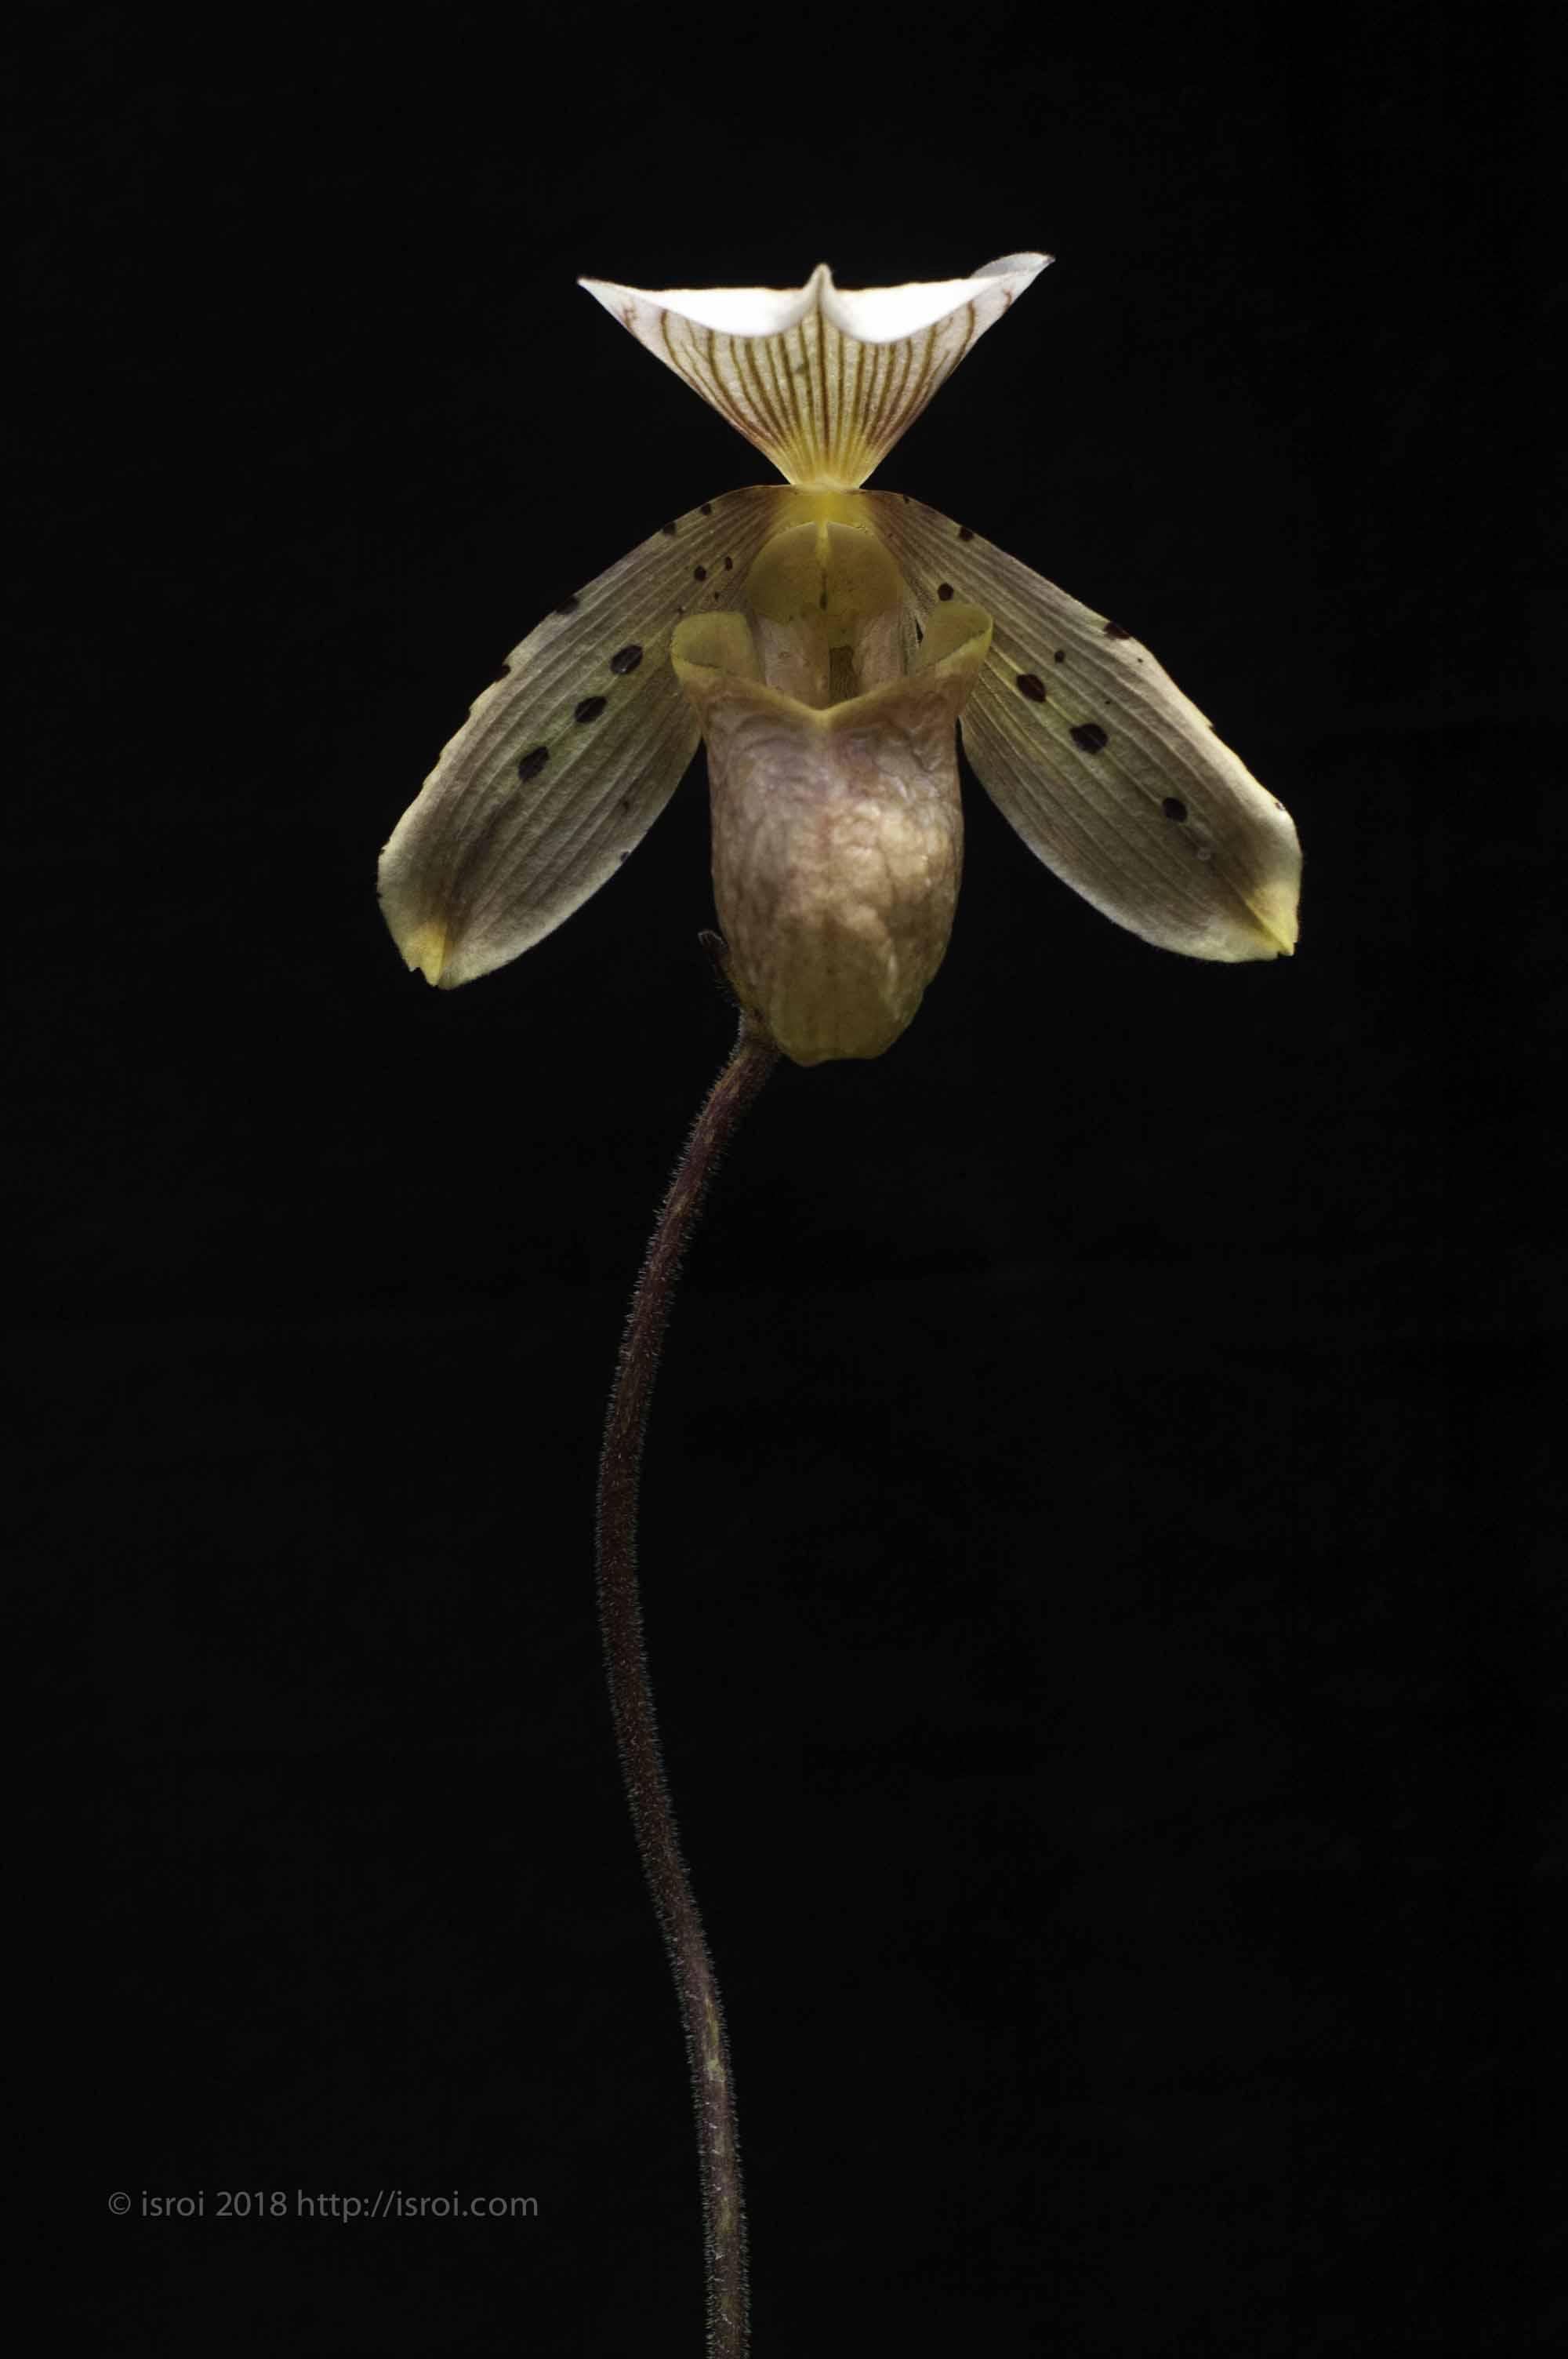 Anggrek kantong spesies Indonesia Paphiopedilum tonsum